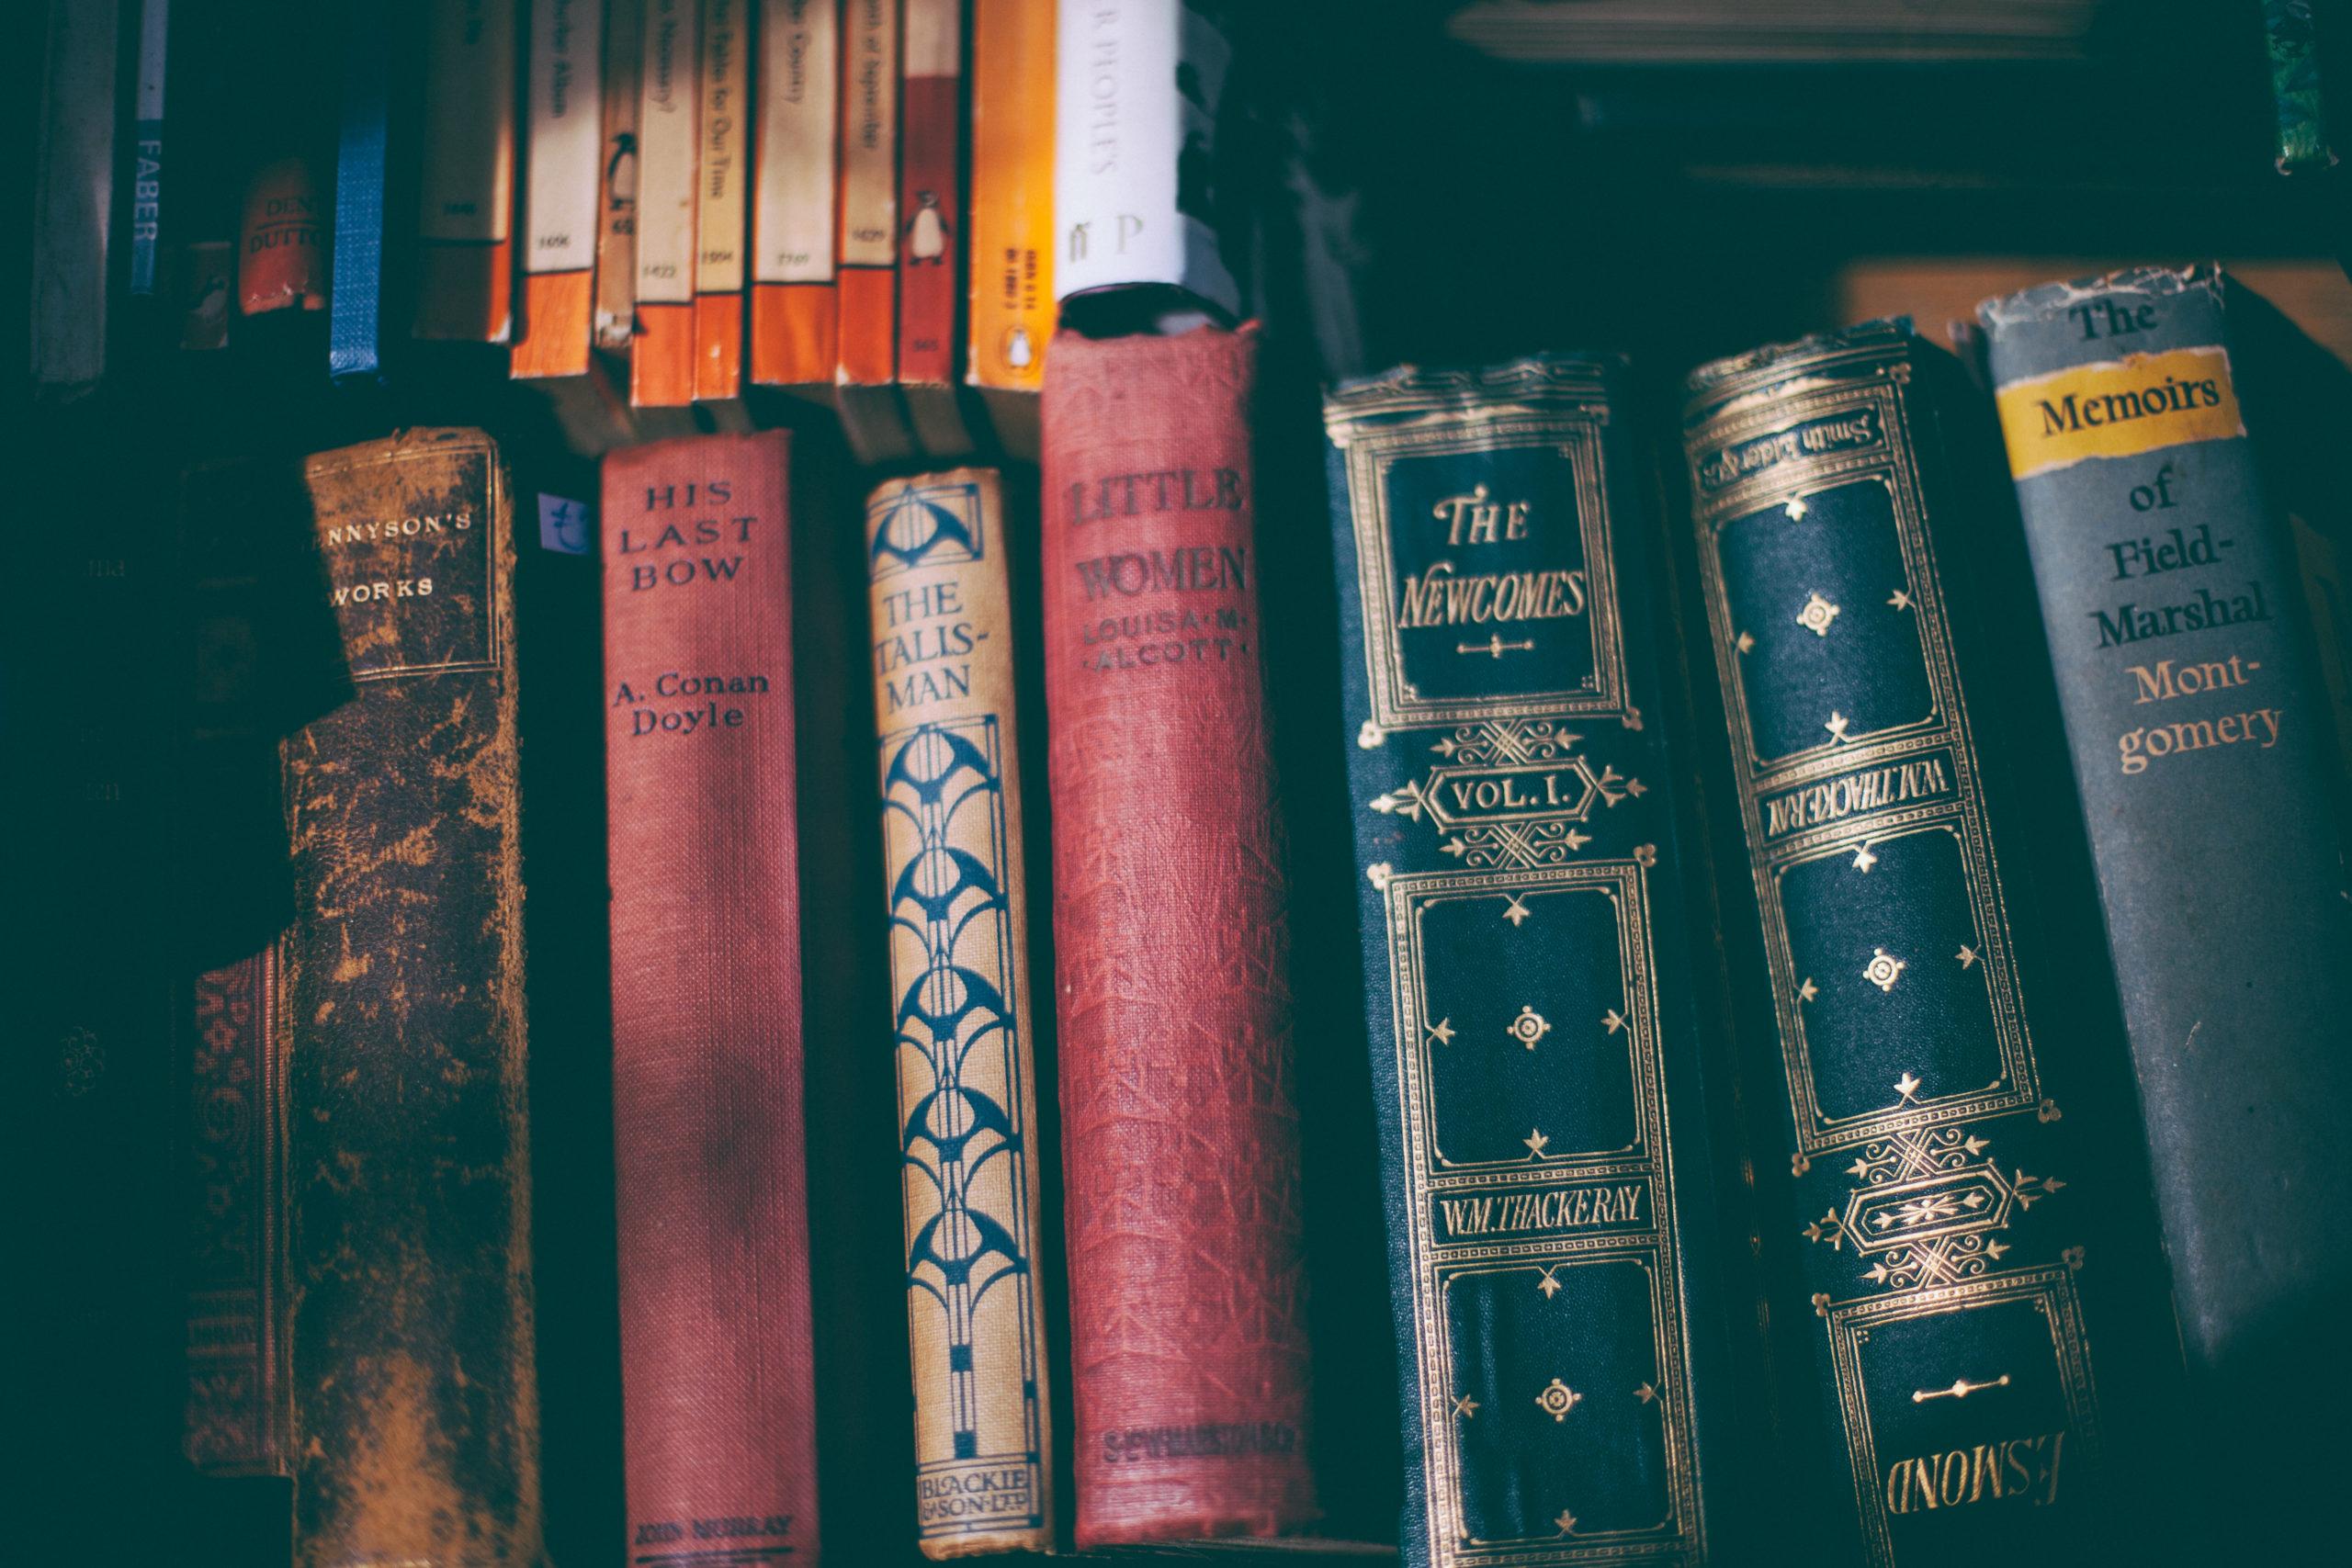 Photo of bookshelf with books such as Little Women, Arthur Conan Doyle etc.